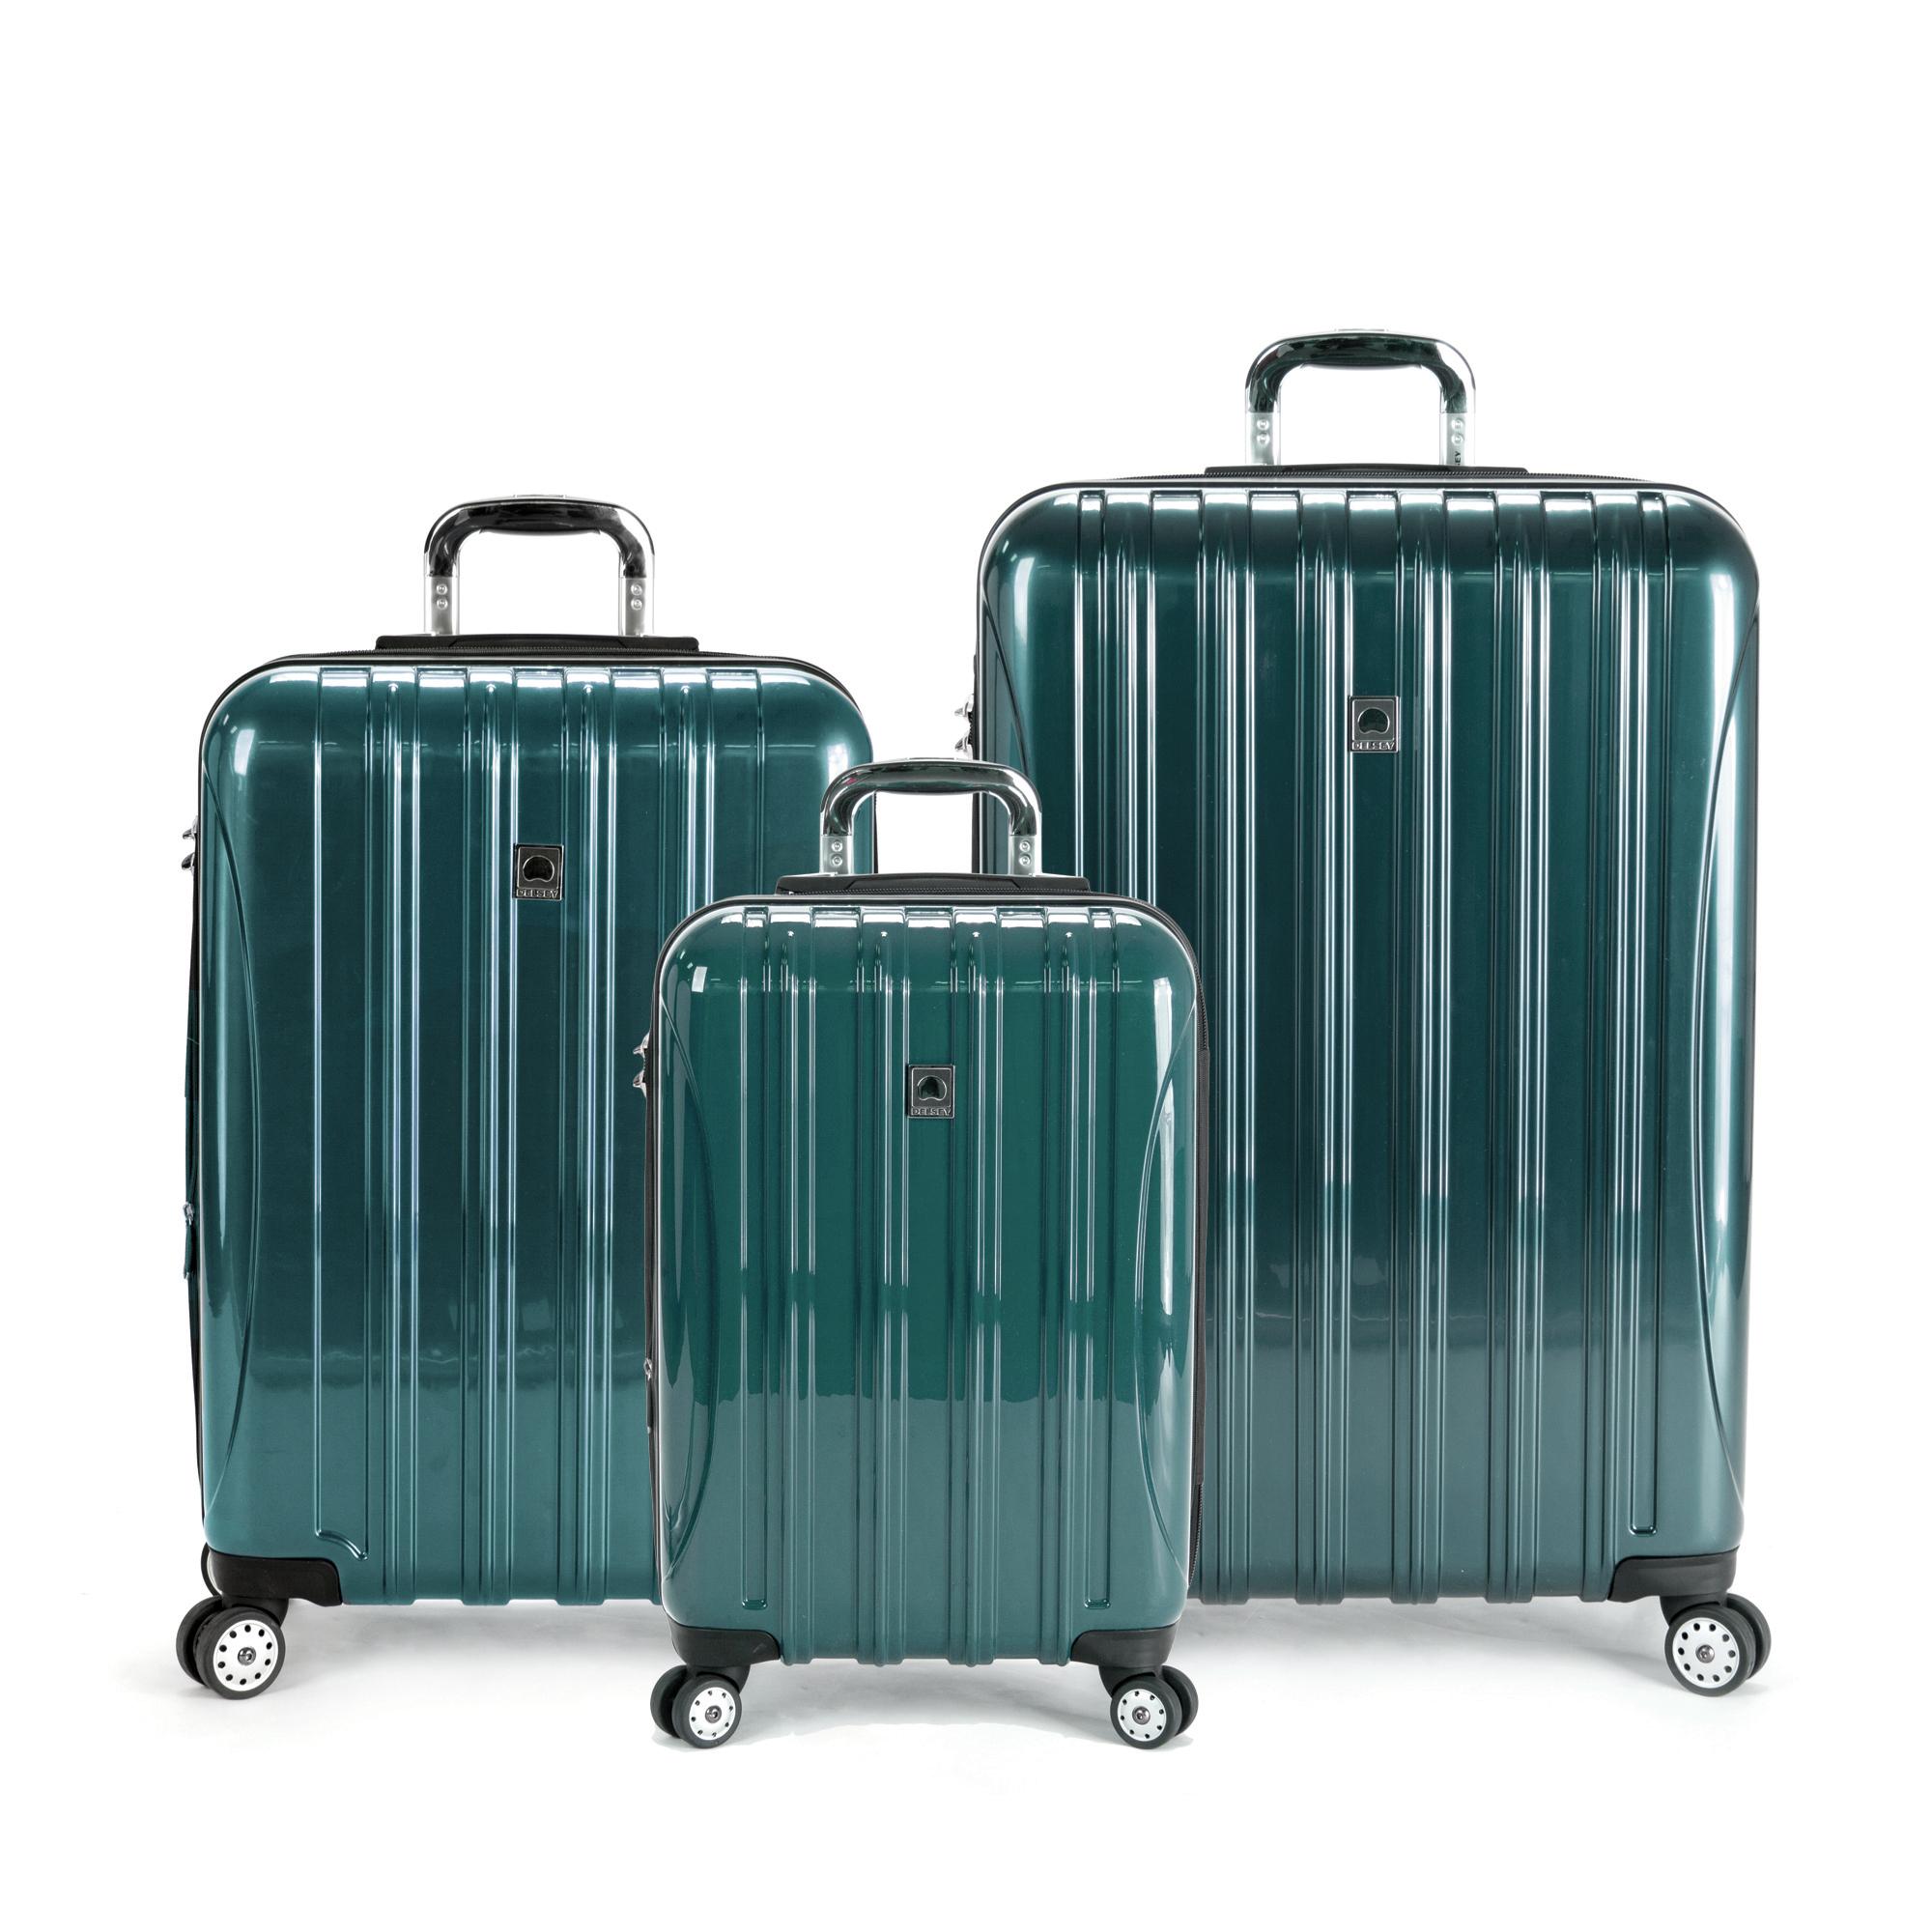 delsey luggage helium aero 3 piece spinner luggage set ebay. Black Bedroom Furniture Sets. Home Design Ideas